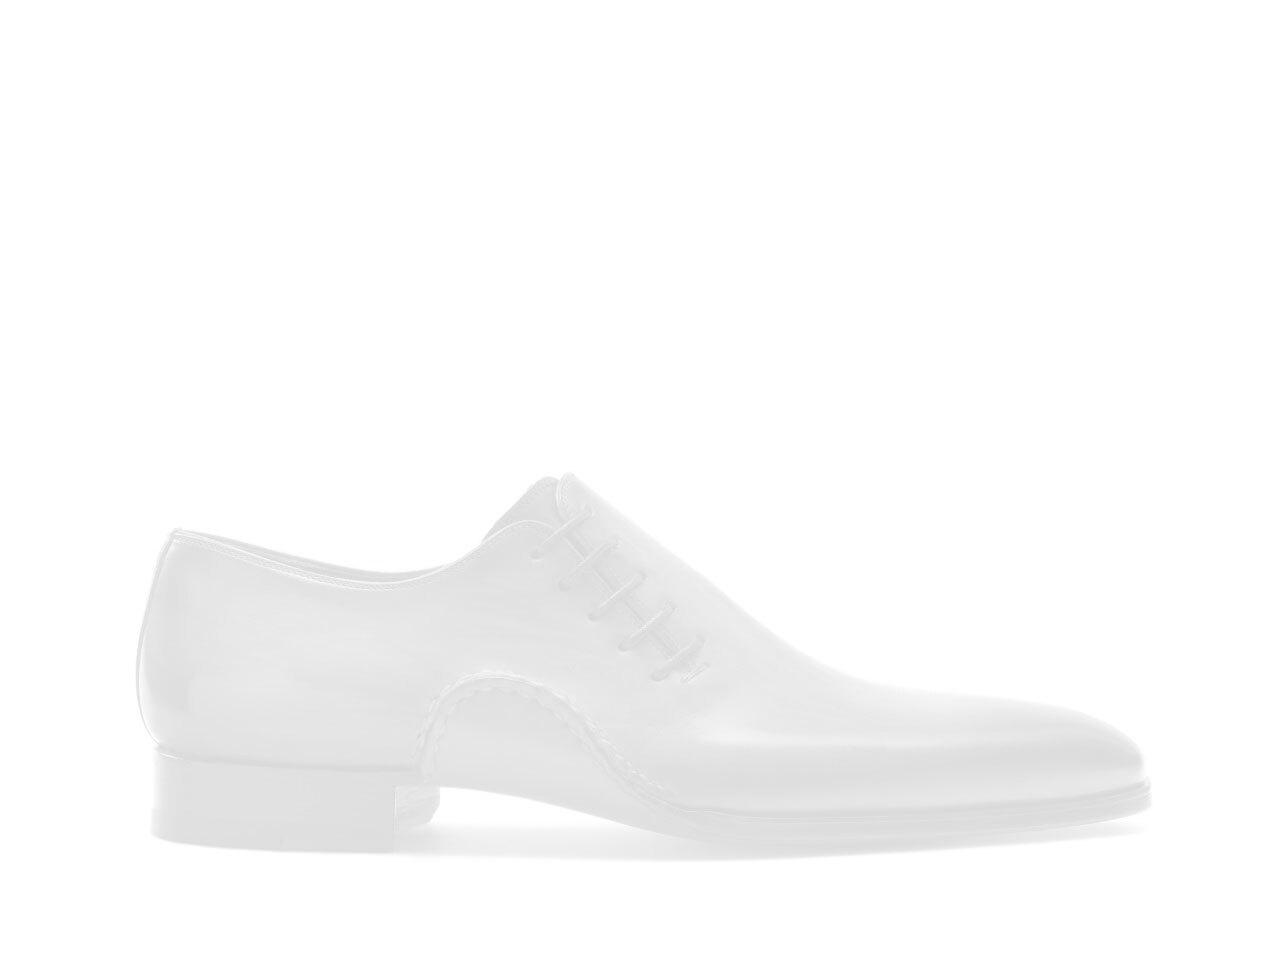 Mid brown suede loafer shoes for men - Magnanni